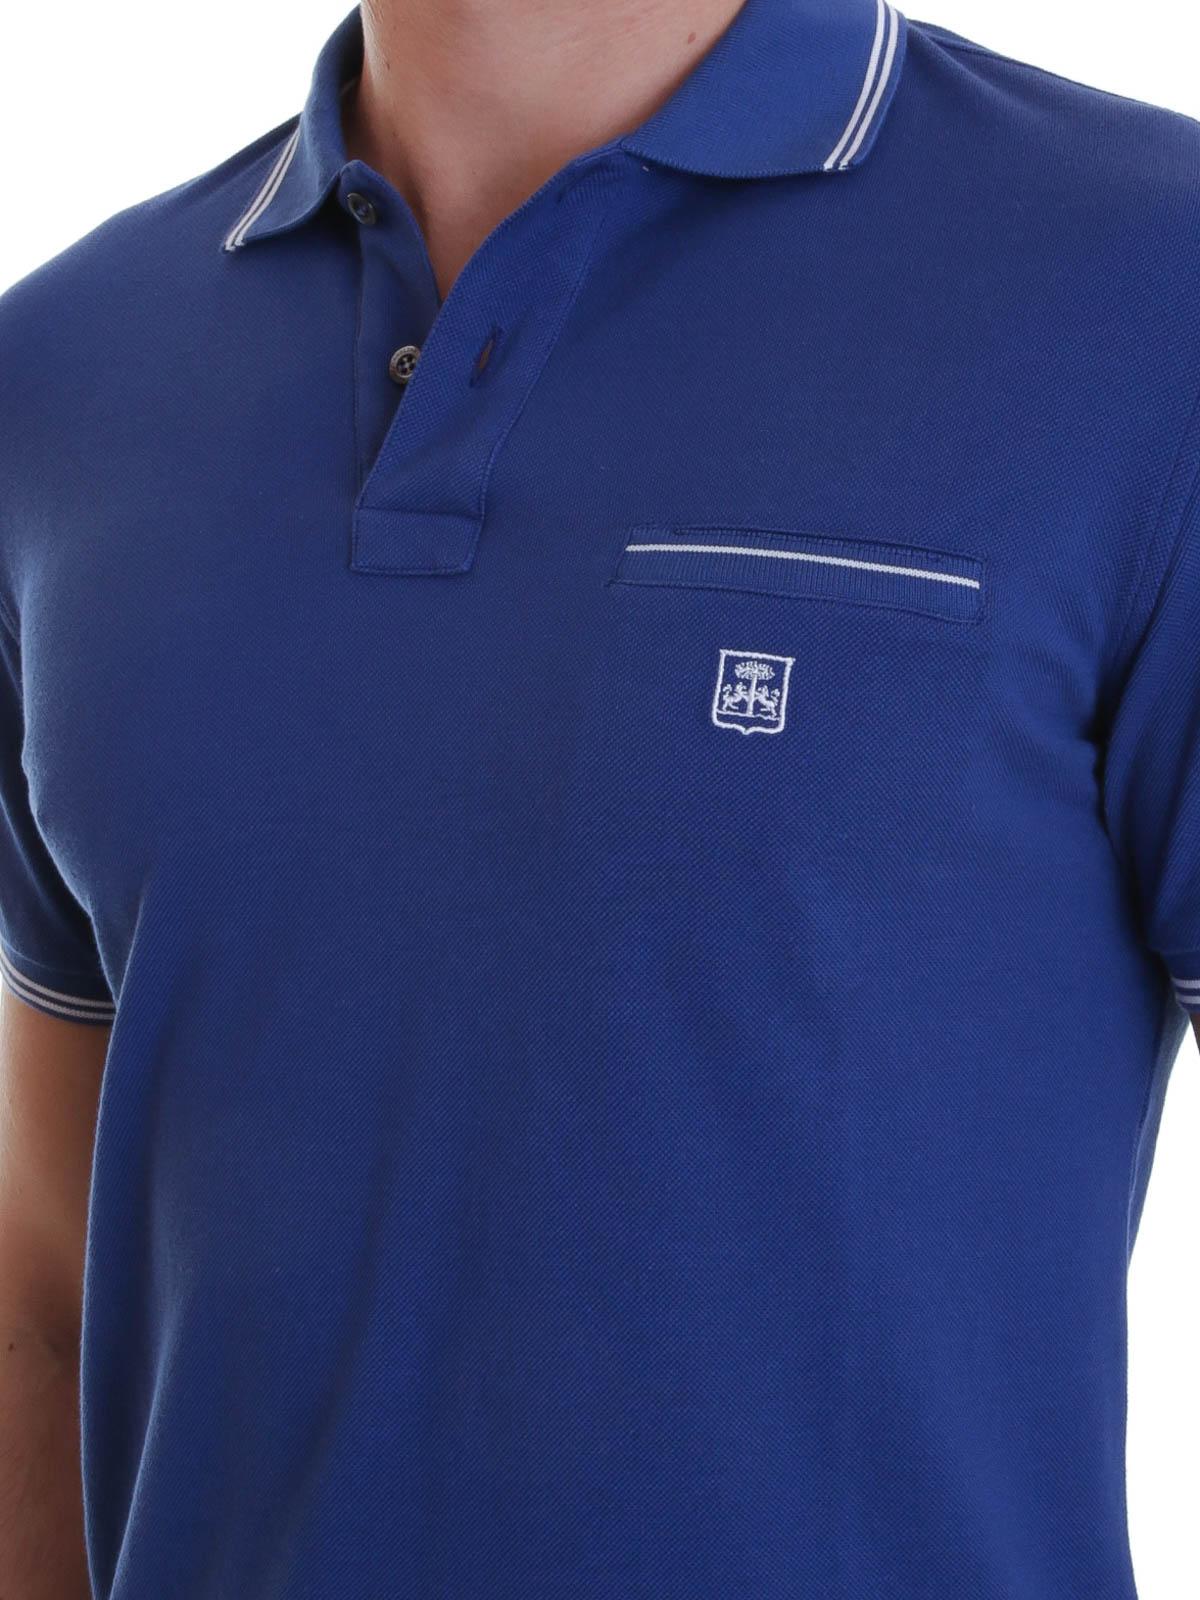 a1a60e64 Corneliani - Polo with contrasting stripes - polo shirts - 15018 09 G572